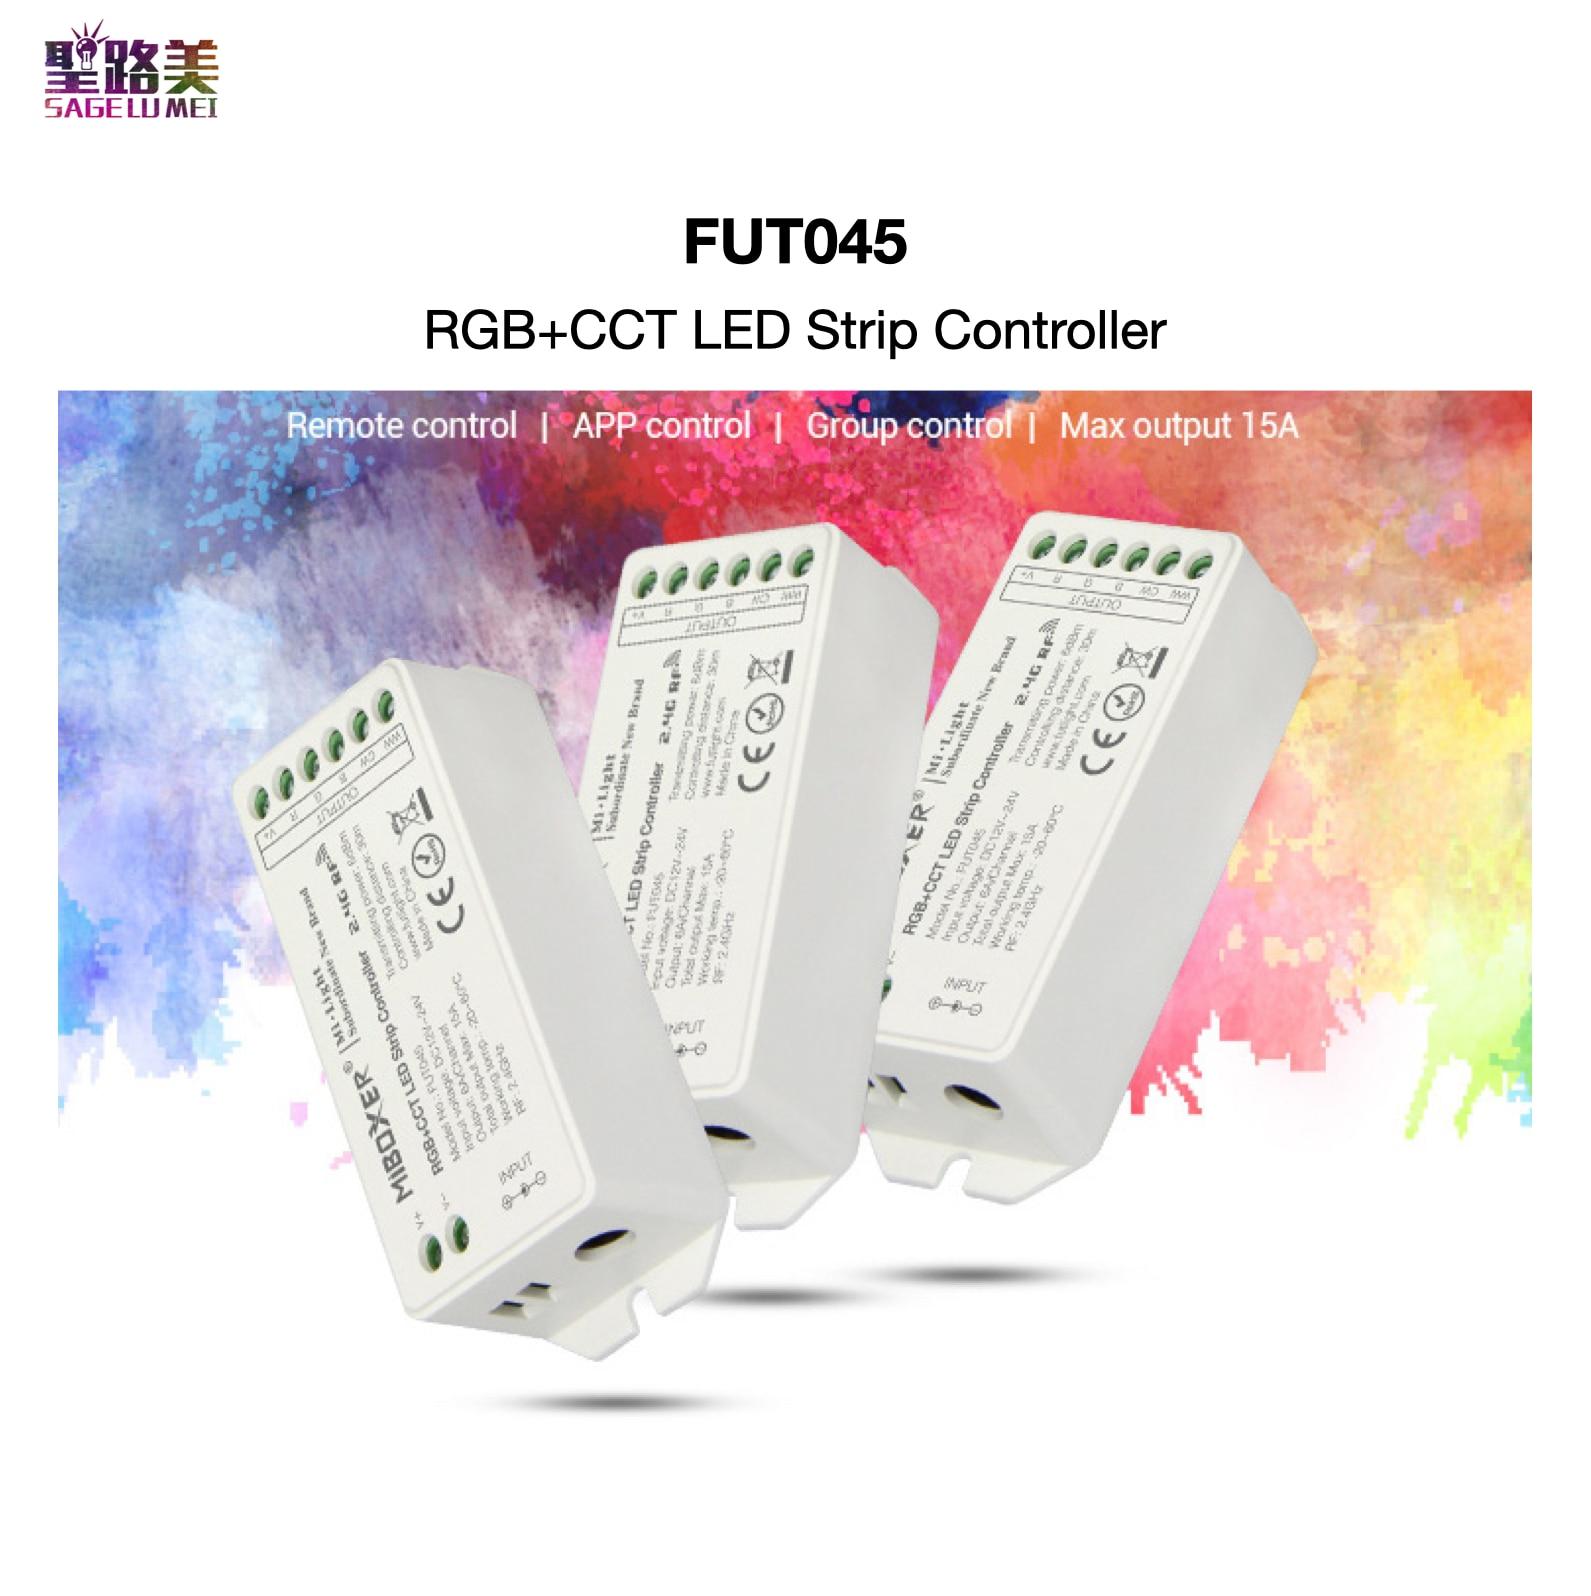 FUT045 RGB + AAC controlador de tira LED APP/2,4 GHz RF/grupo Control de Auto-sincronización Auto-trans mi tting Mi boxeador Mi luz Panel táctil B8 montado en la pared; Atenuador RF remoto FUT089 de 8 zonas; Controlador led inteligente LS2 5 en 1 para RGB + CCT, tira led Miboxer